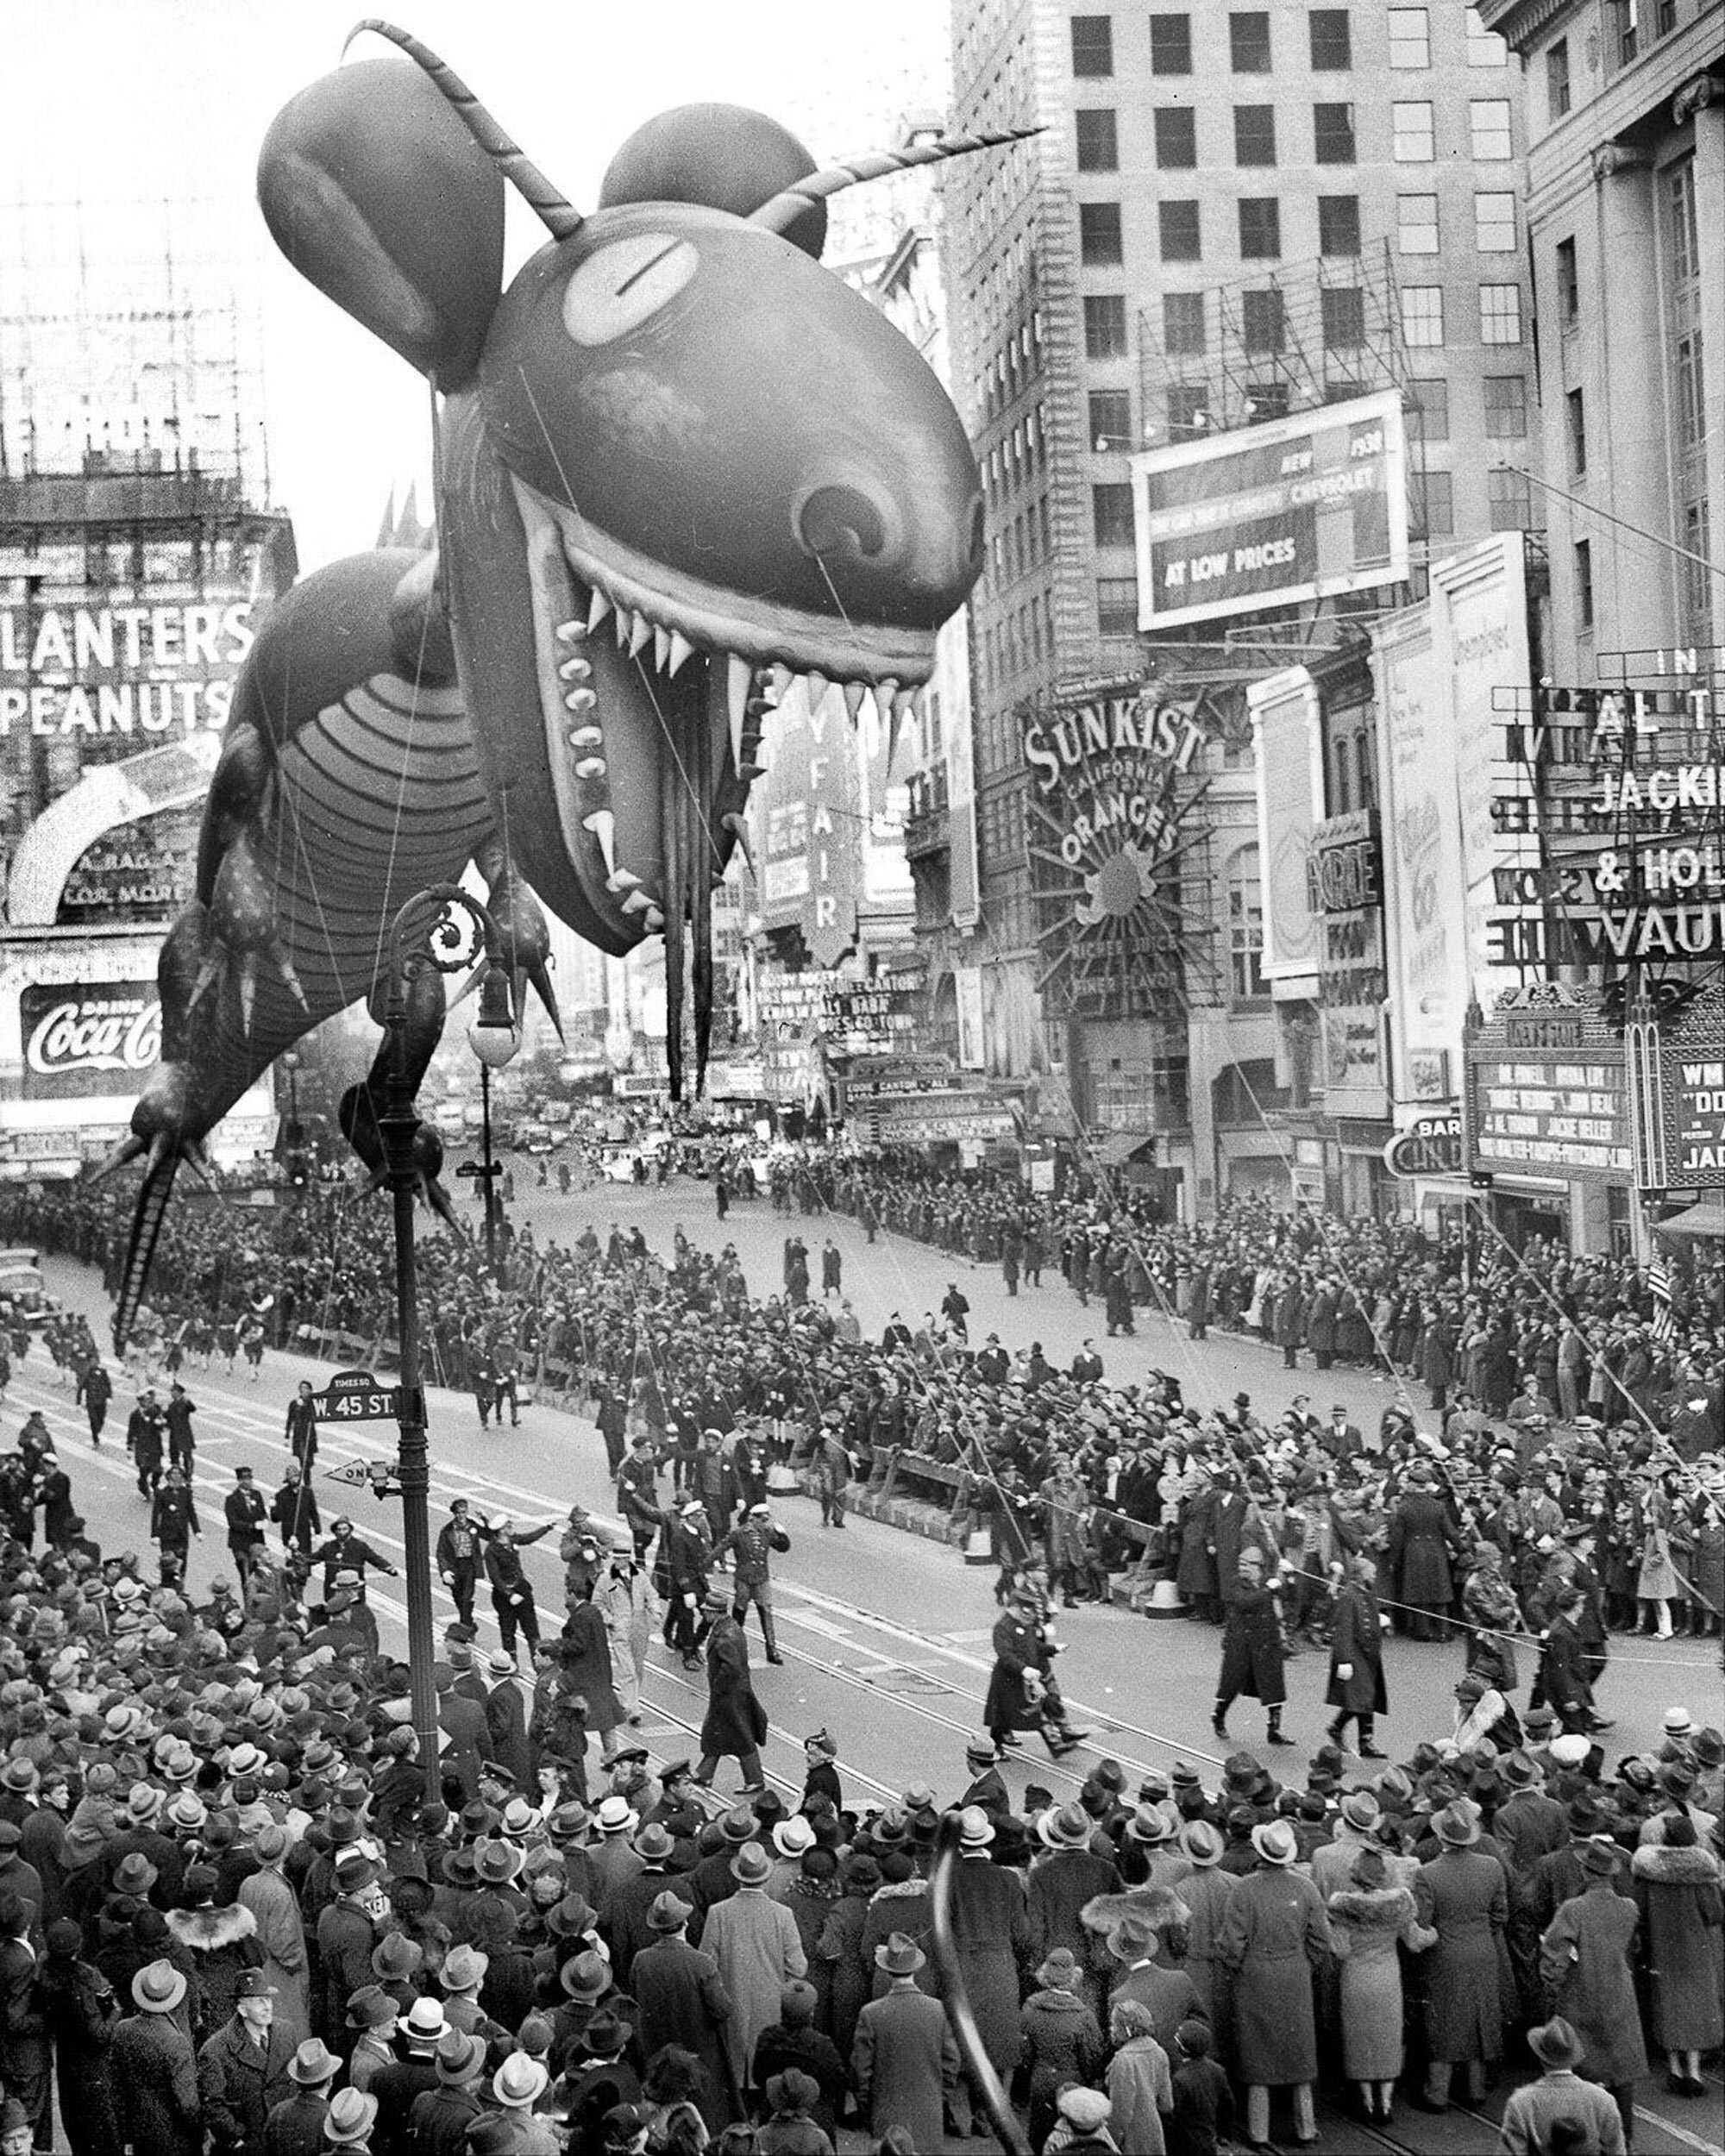 Sea-Monster-Parade-Dino-WalterKellehern_NYDailyNewsArchive_Getty-macysparade-26.jpg